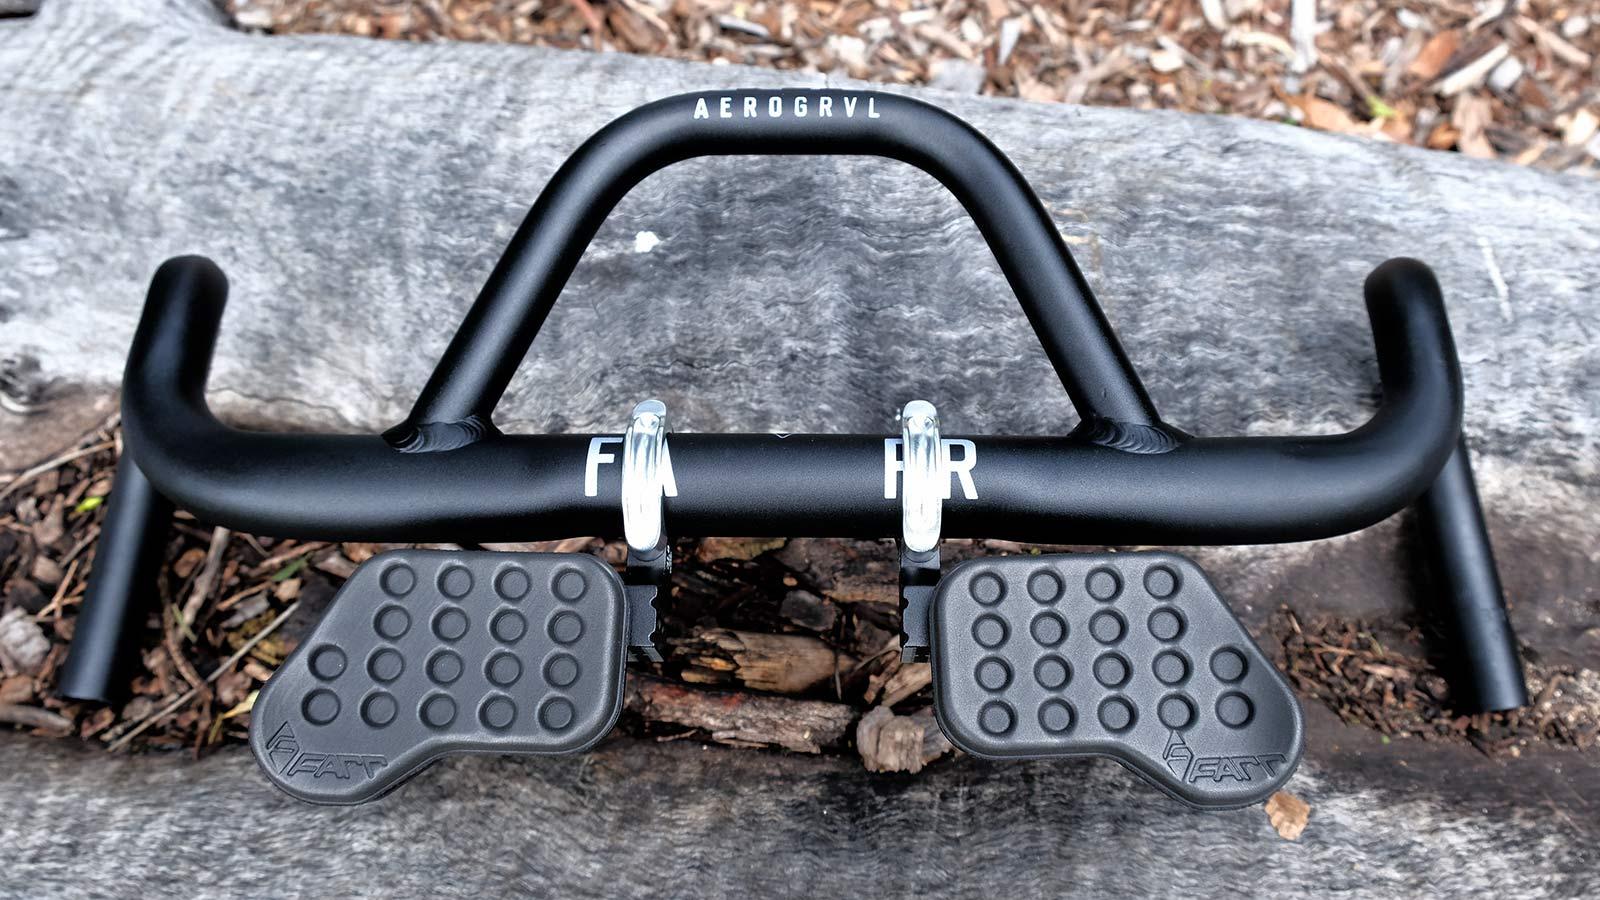 Farr Arm Rest Kit v2 aero bar bolt-on arm rests forearm support,top